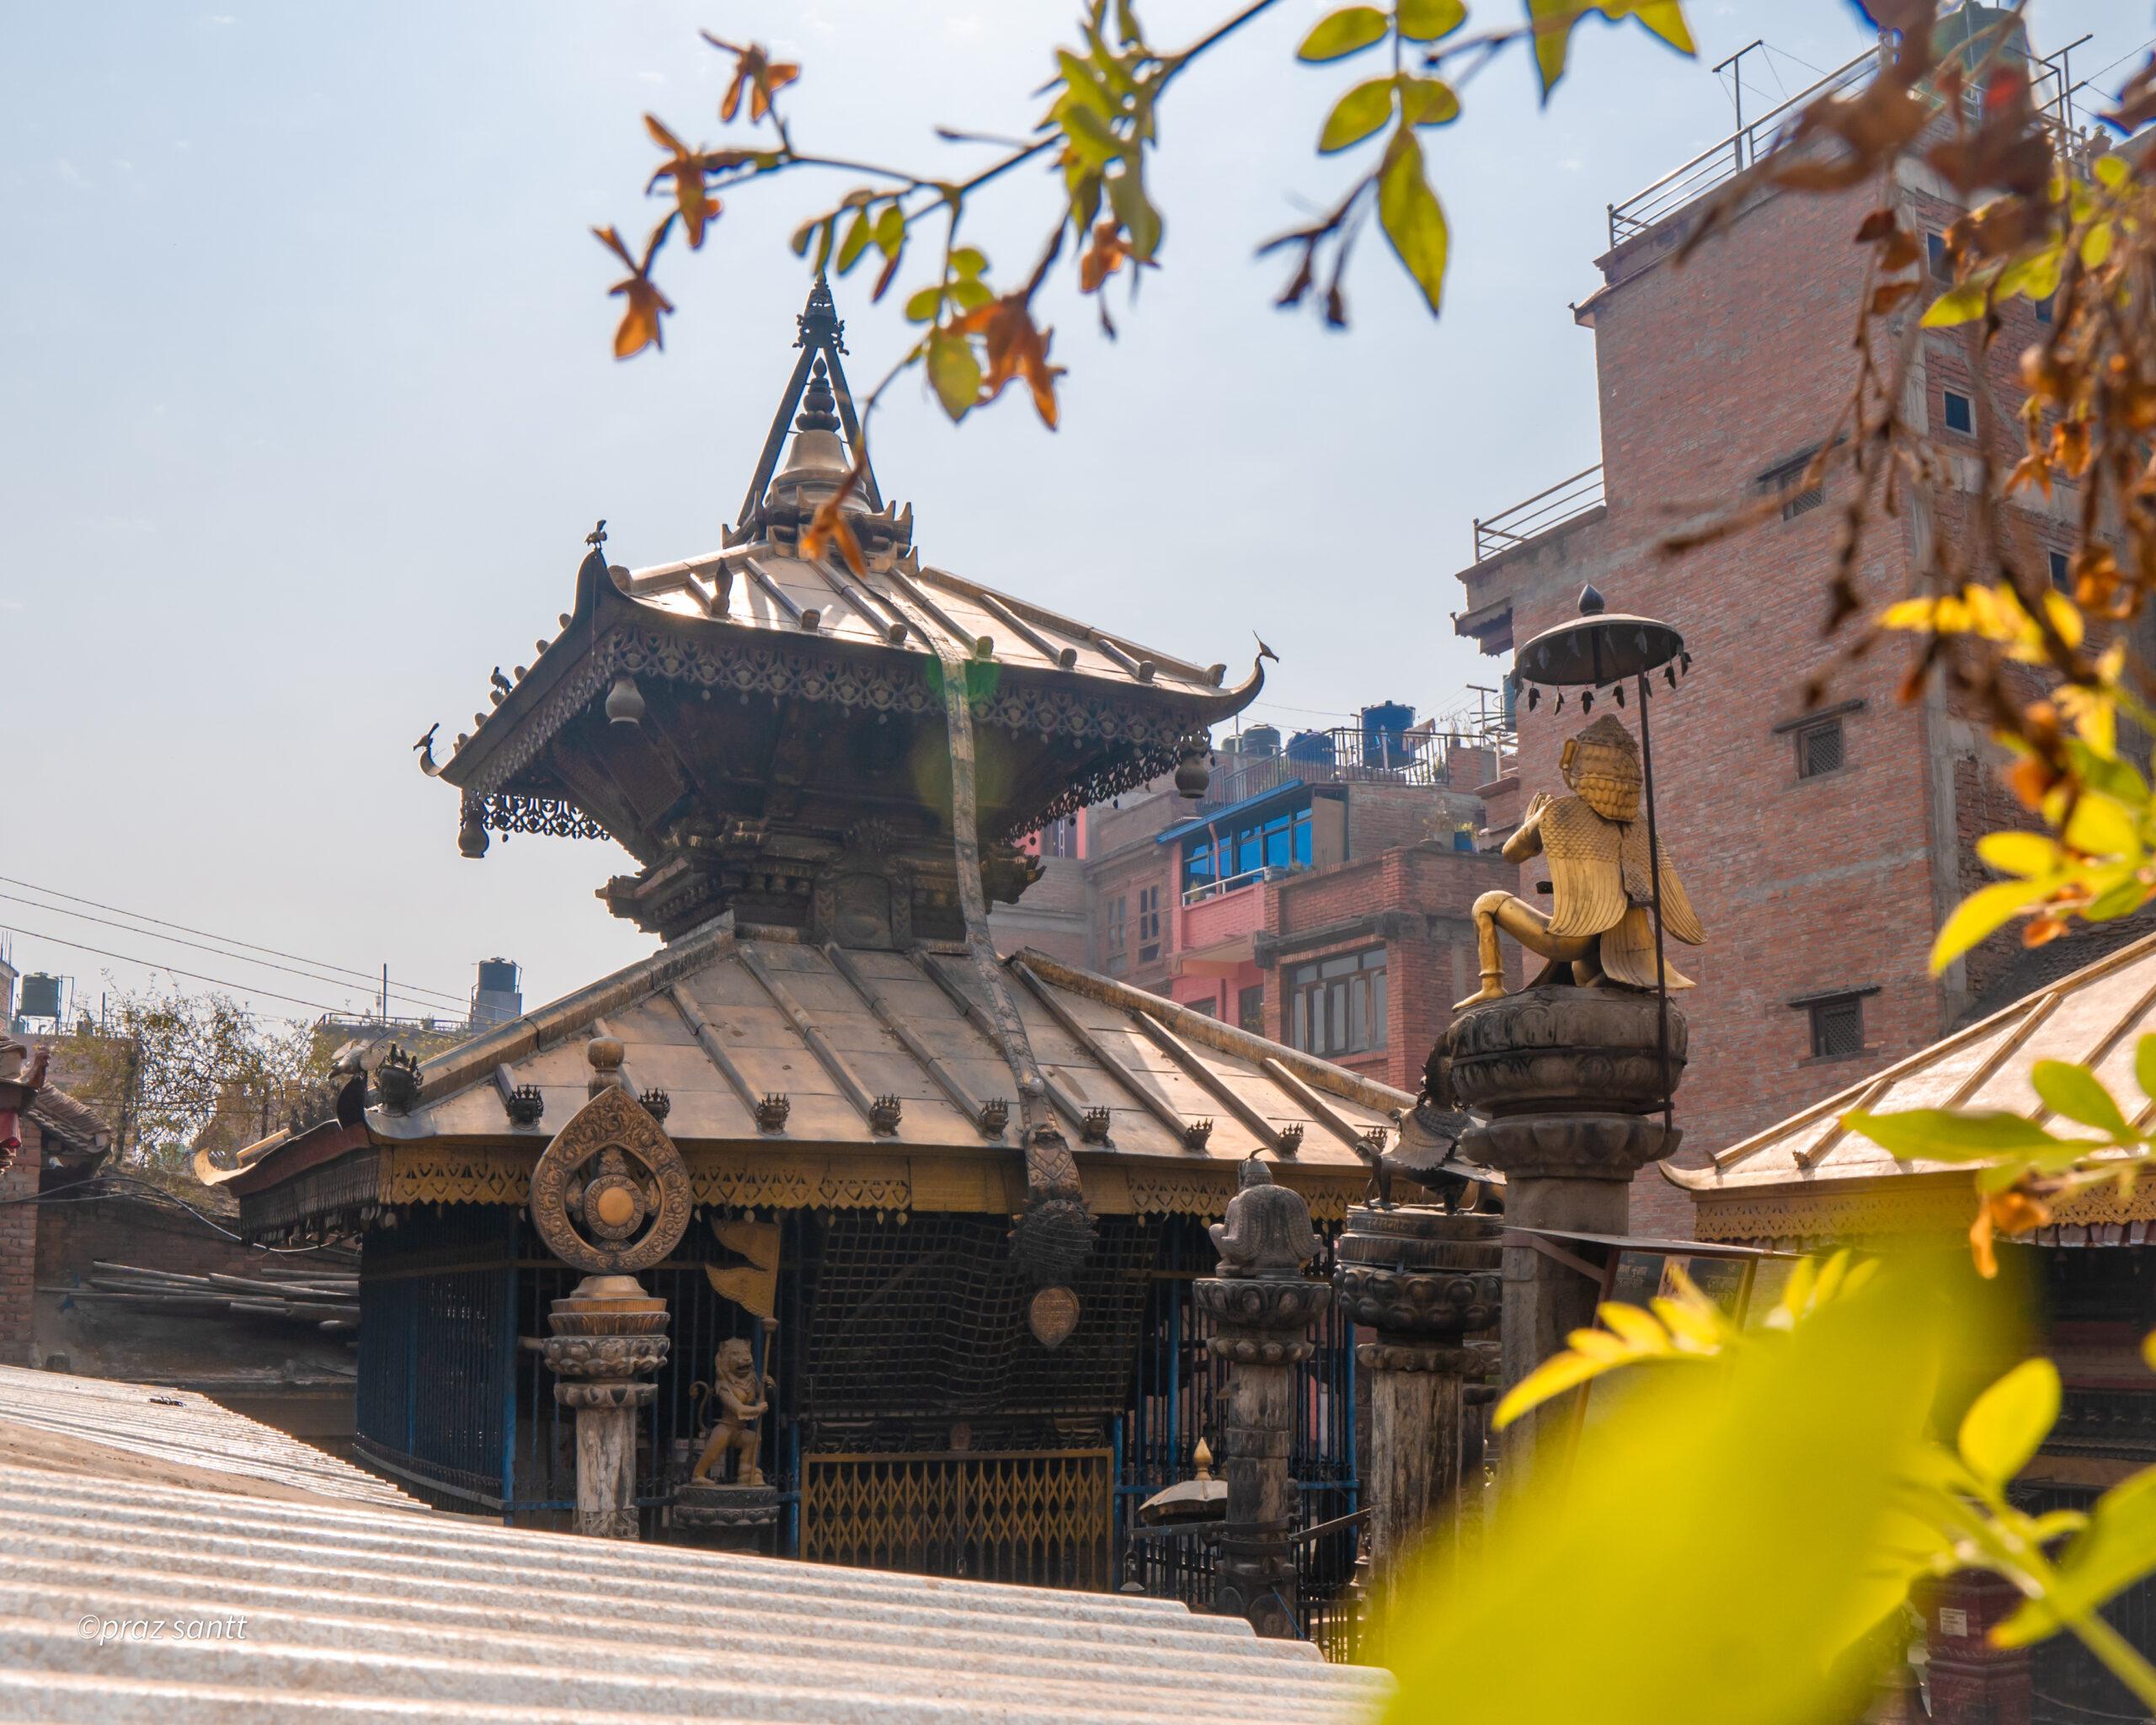 Wakupati Narayan Temple, Bhaktapur image